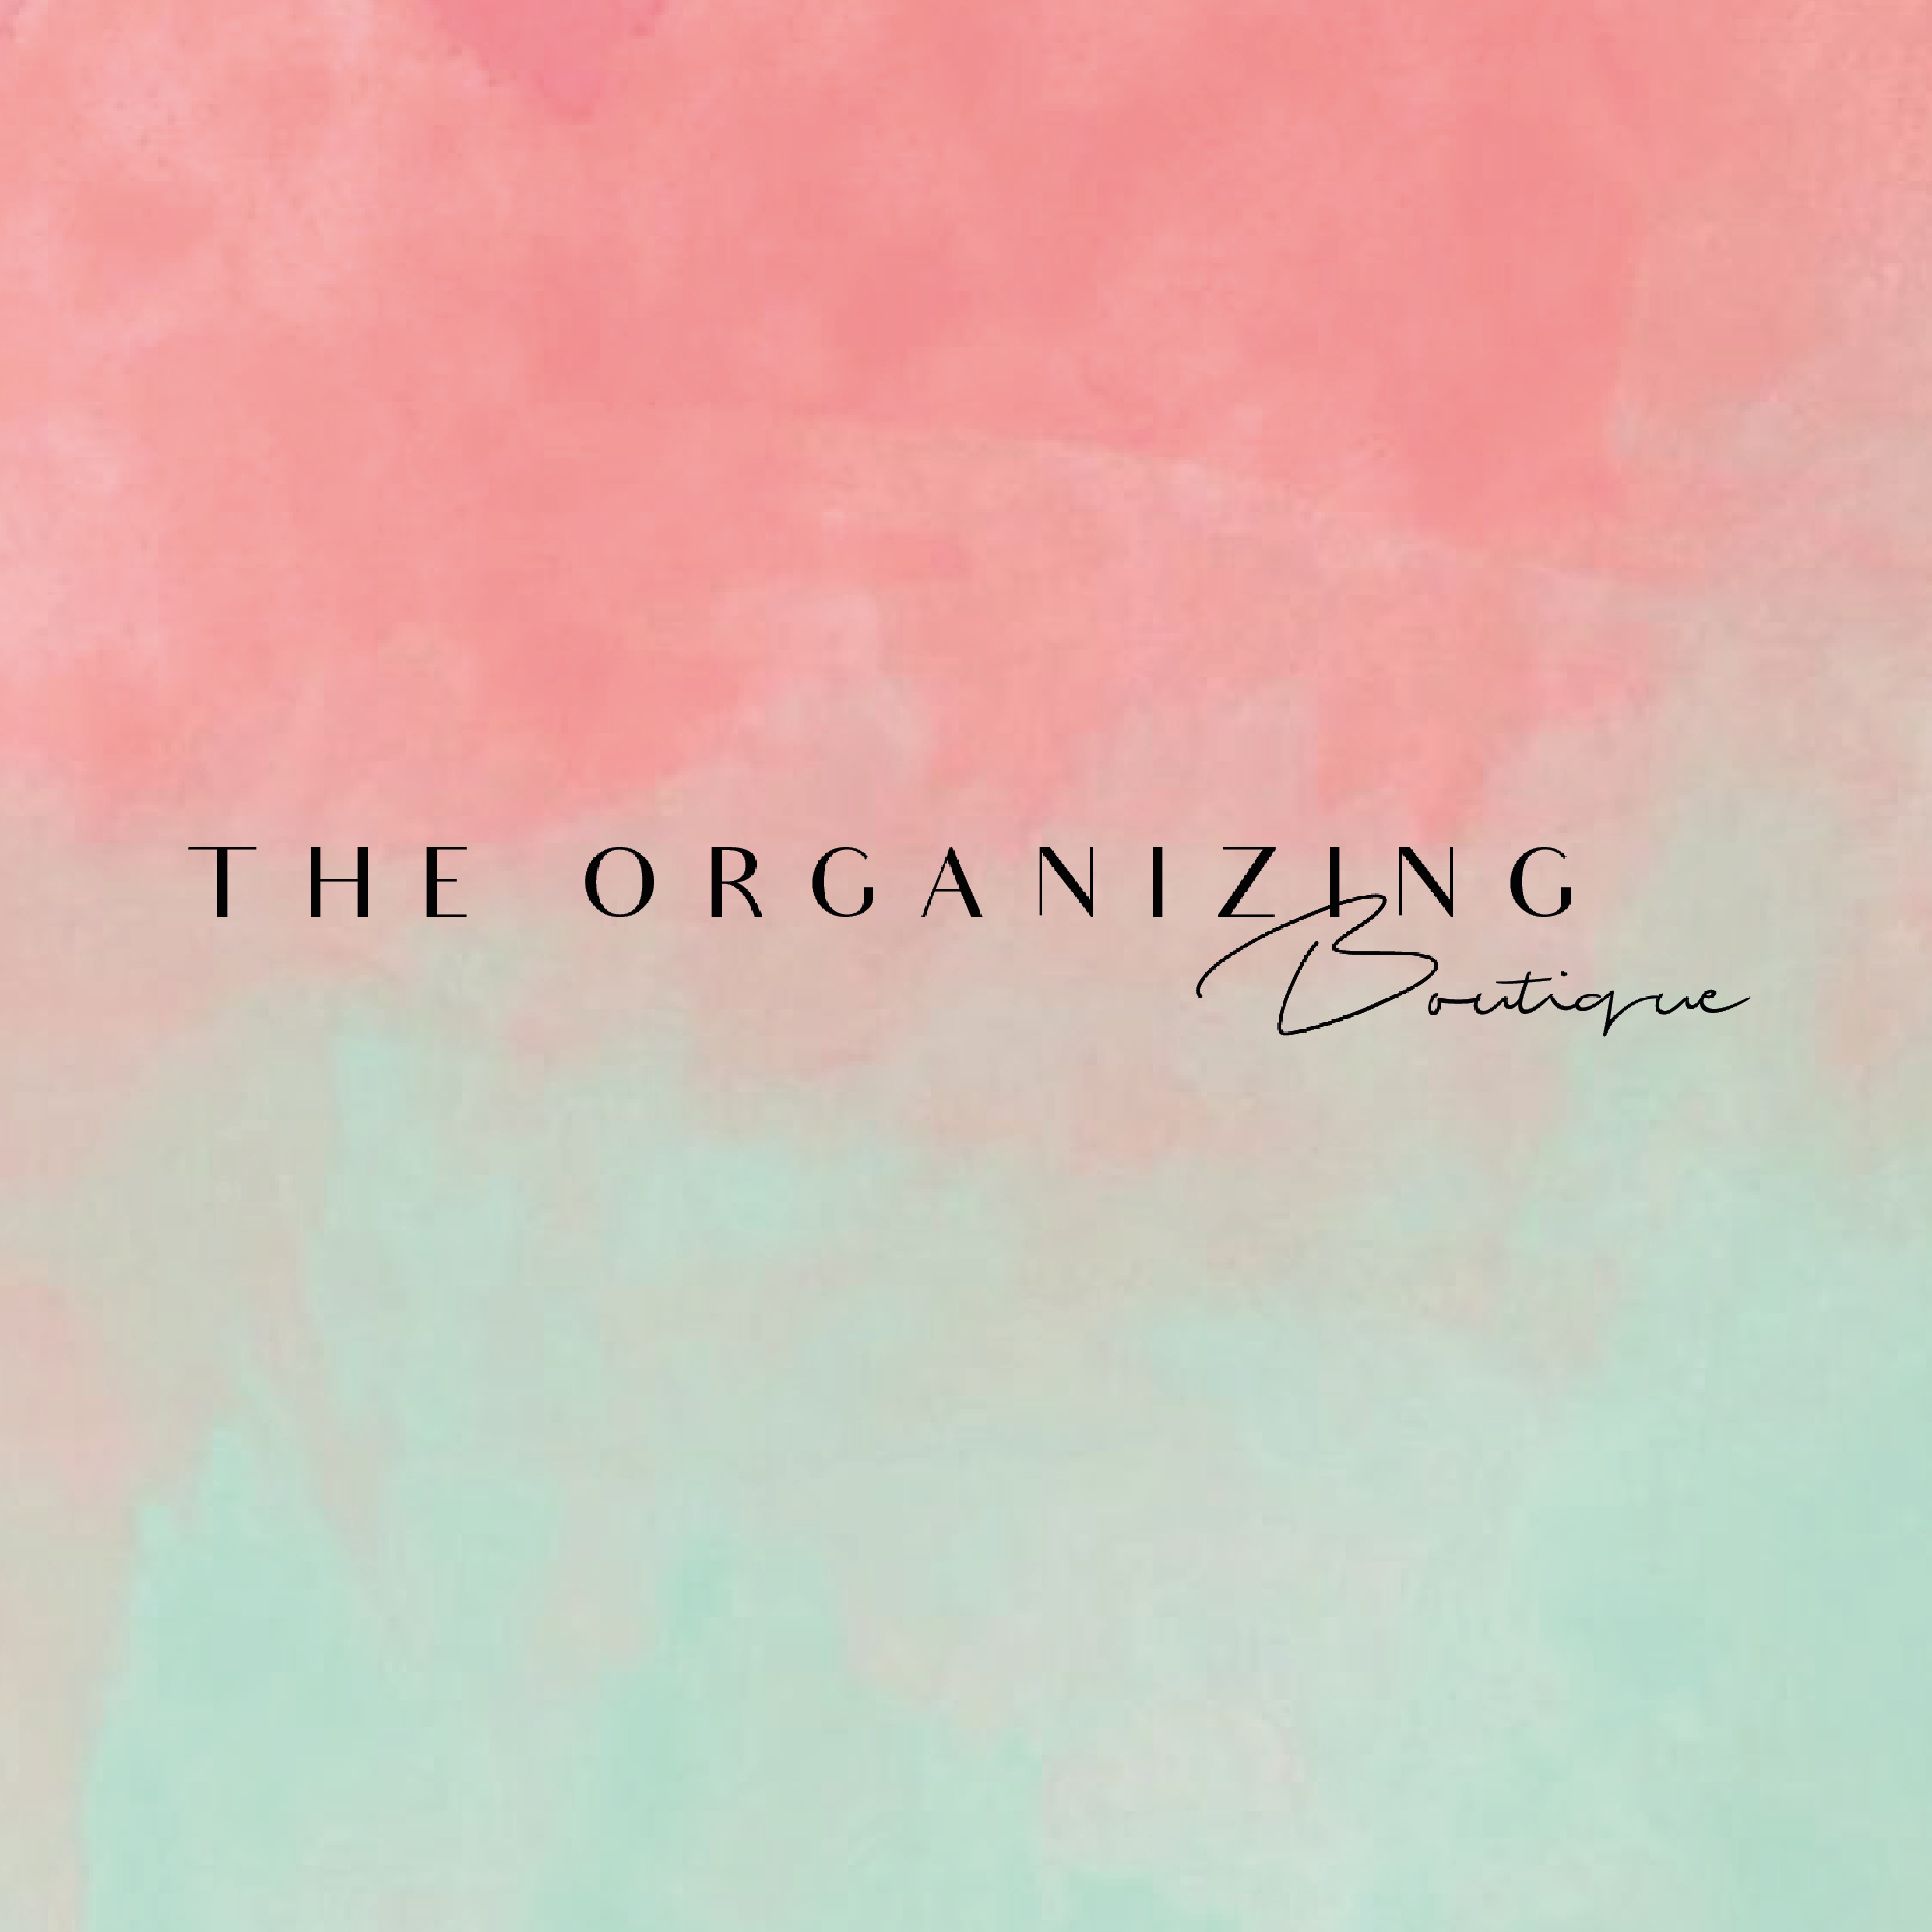 The Organizing Boutique - logo op achtergrond met interieur-01.png